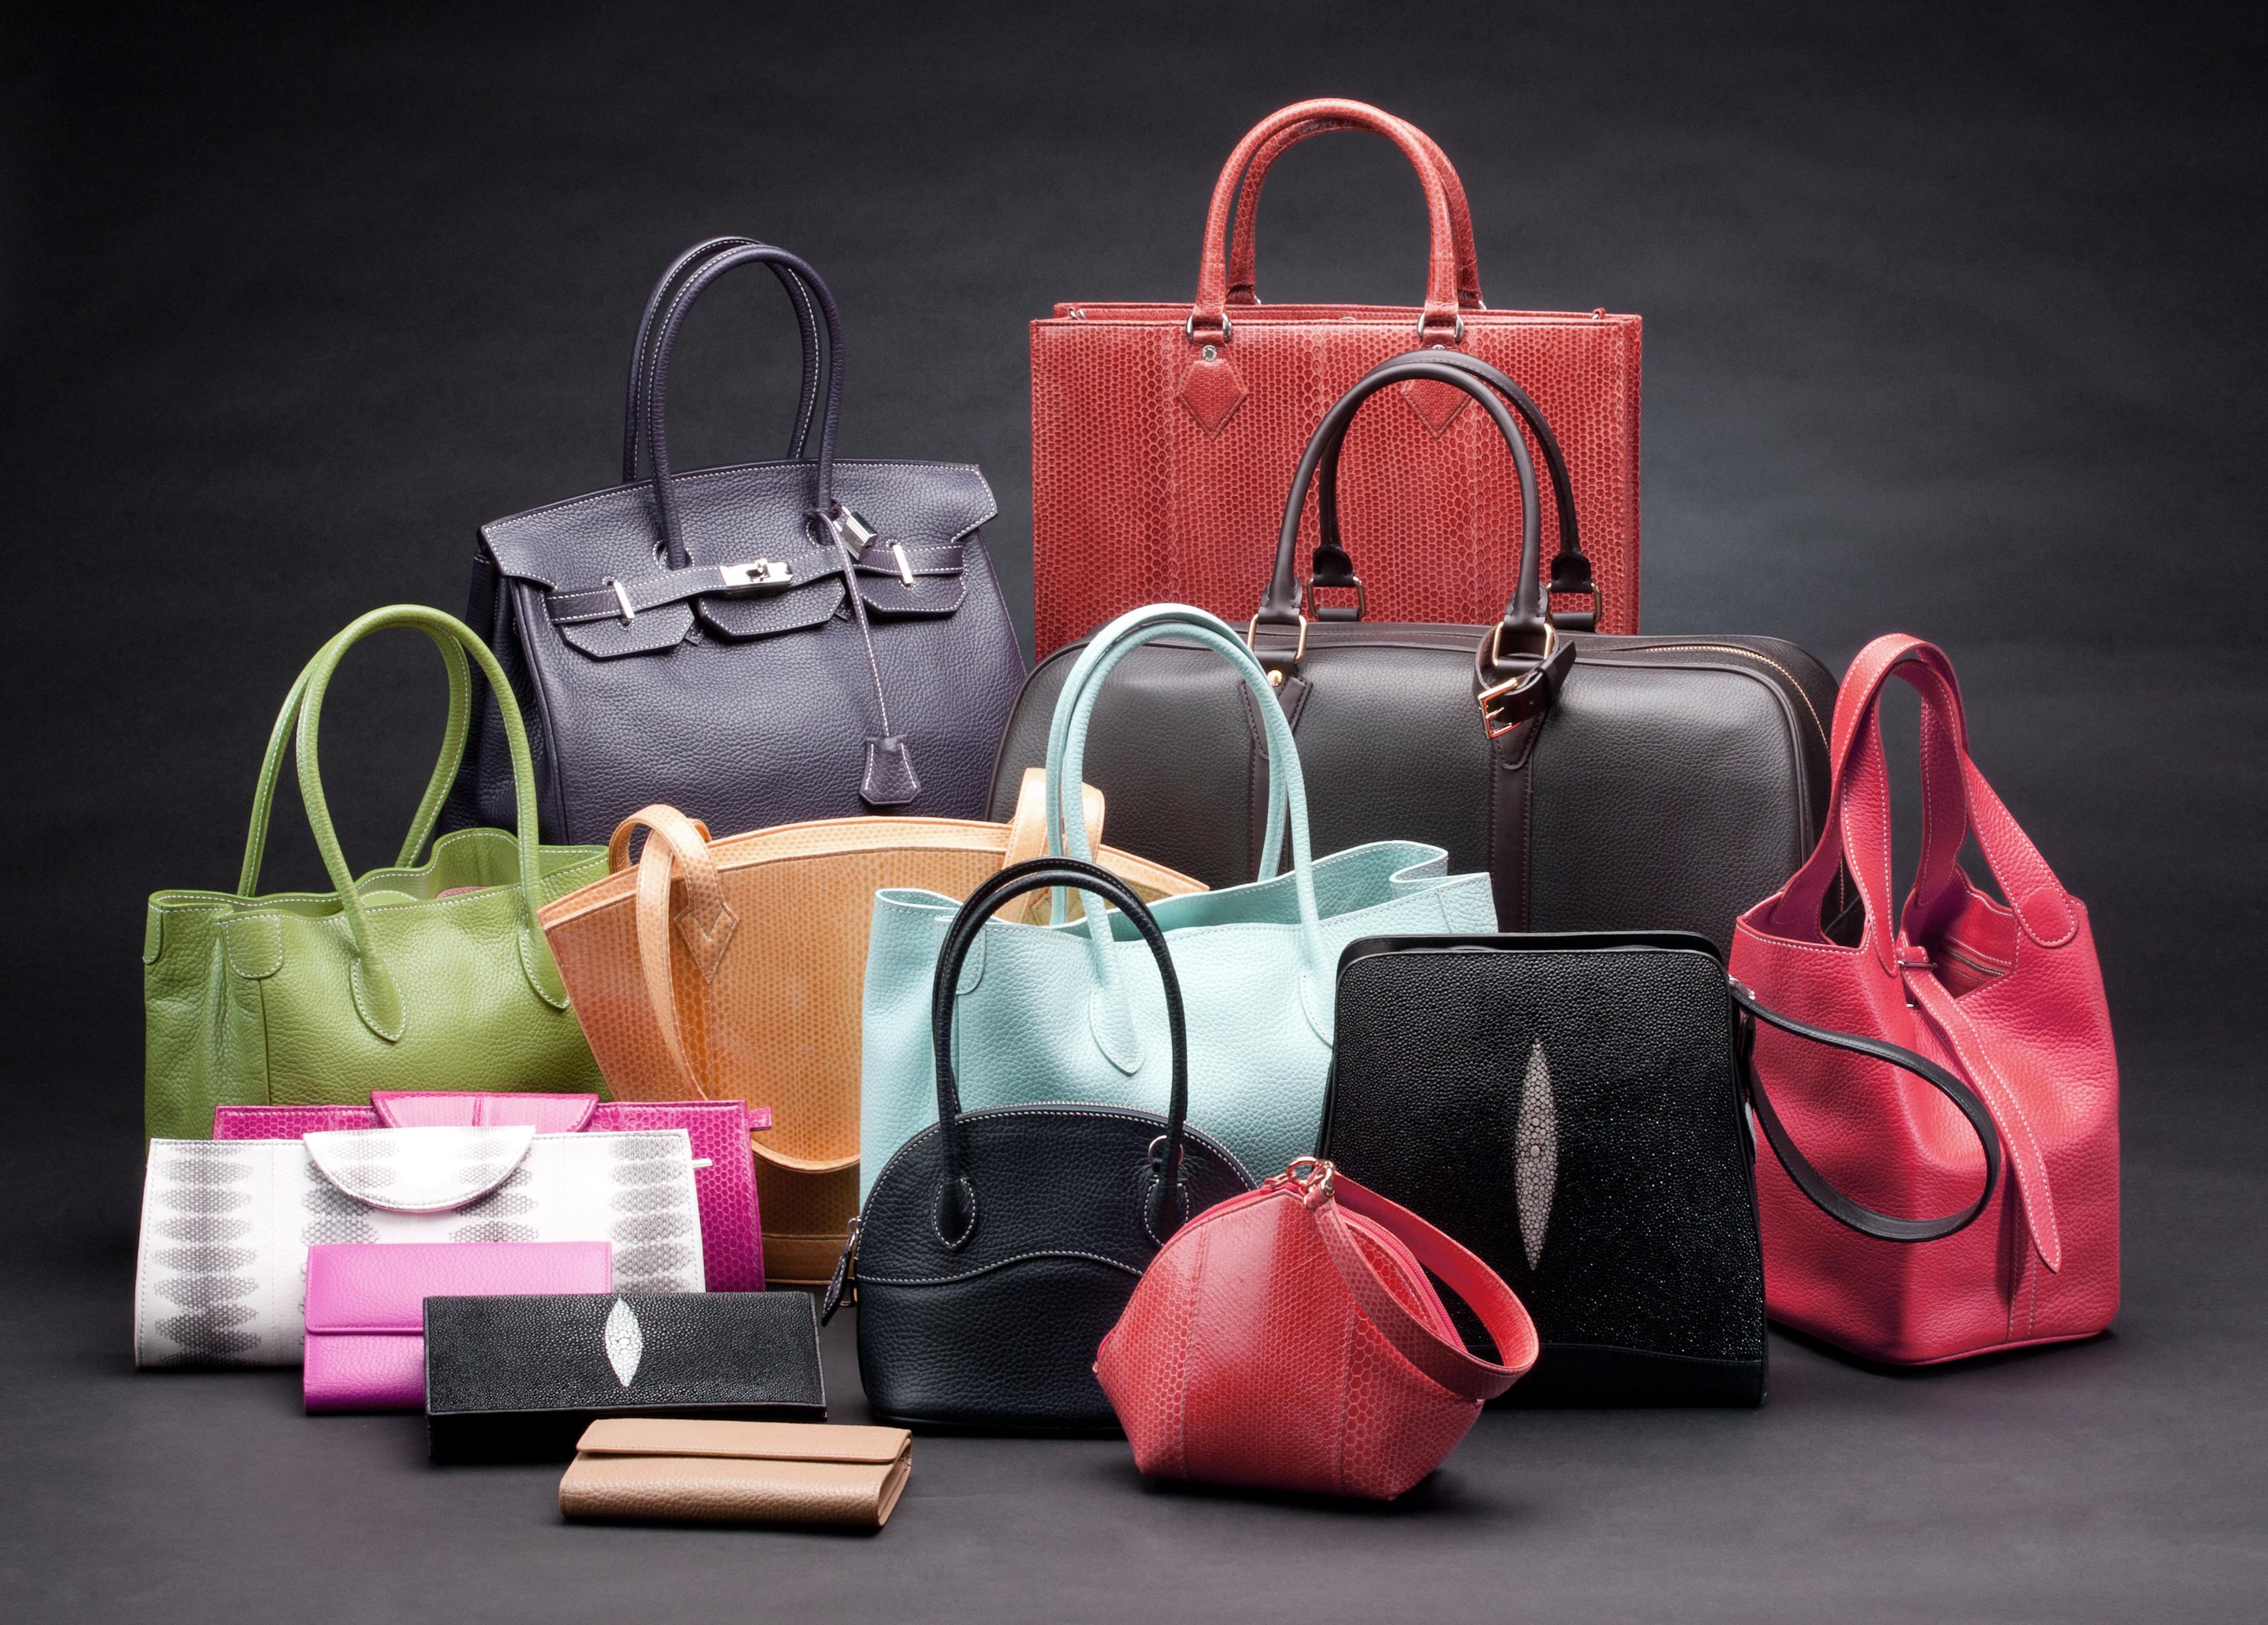 Leather handbags on display.